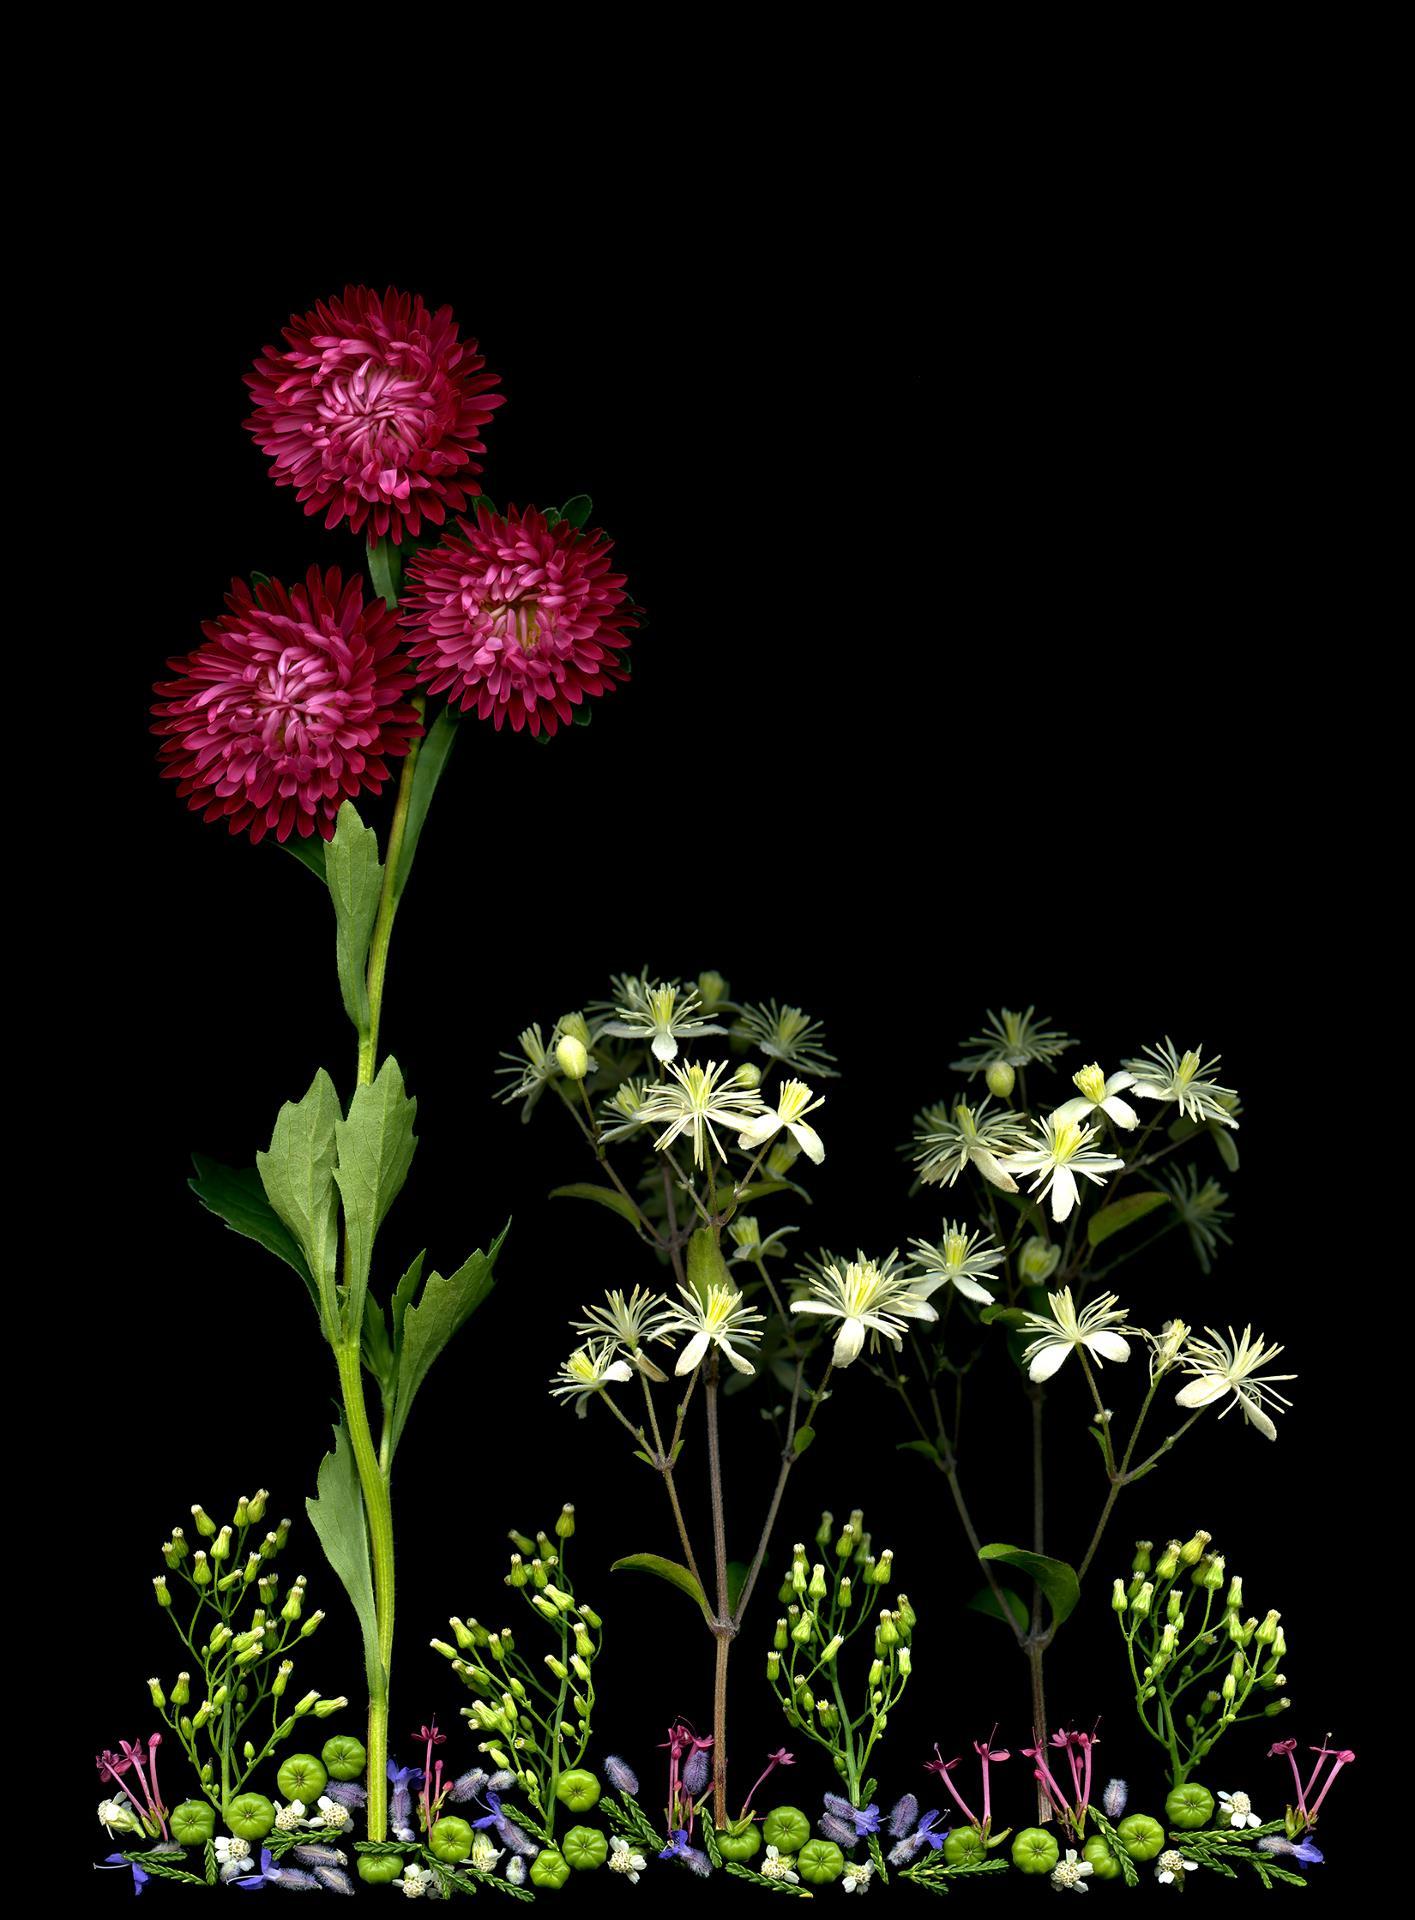 Fretta Cravens, Flower Landscape #22